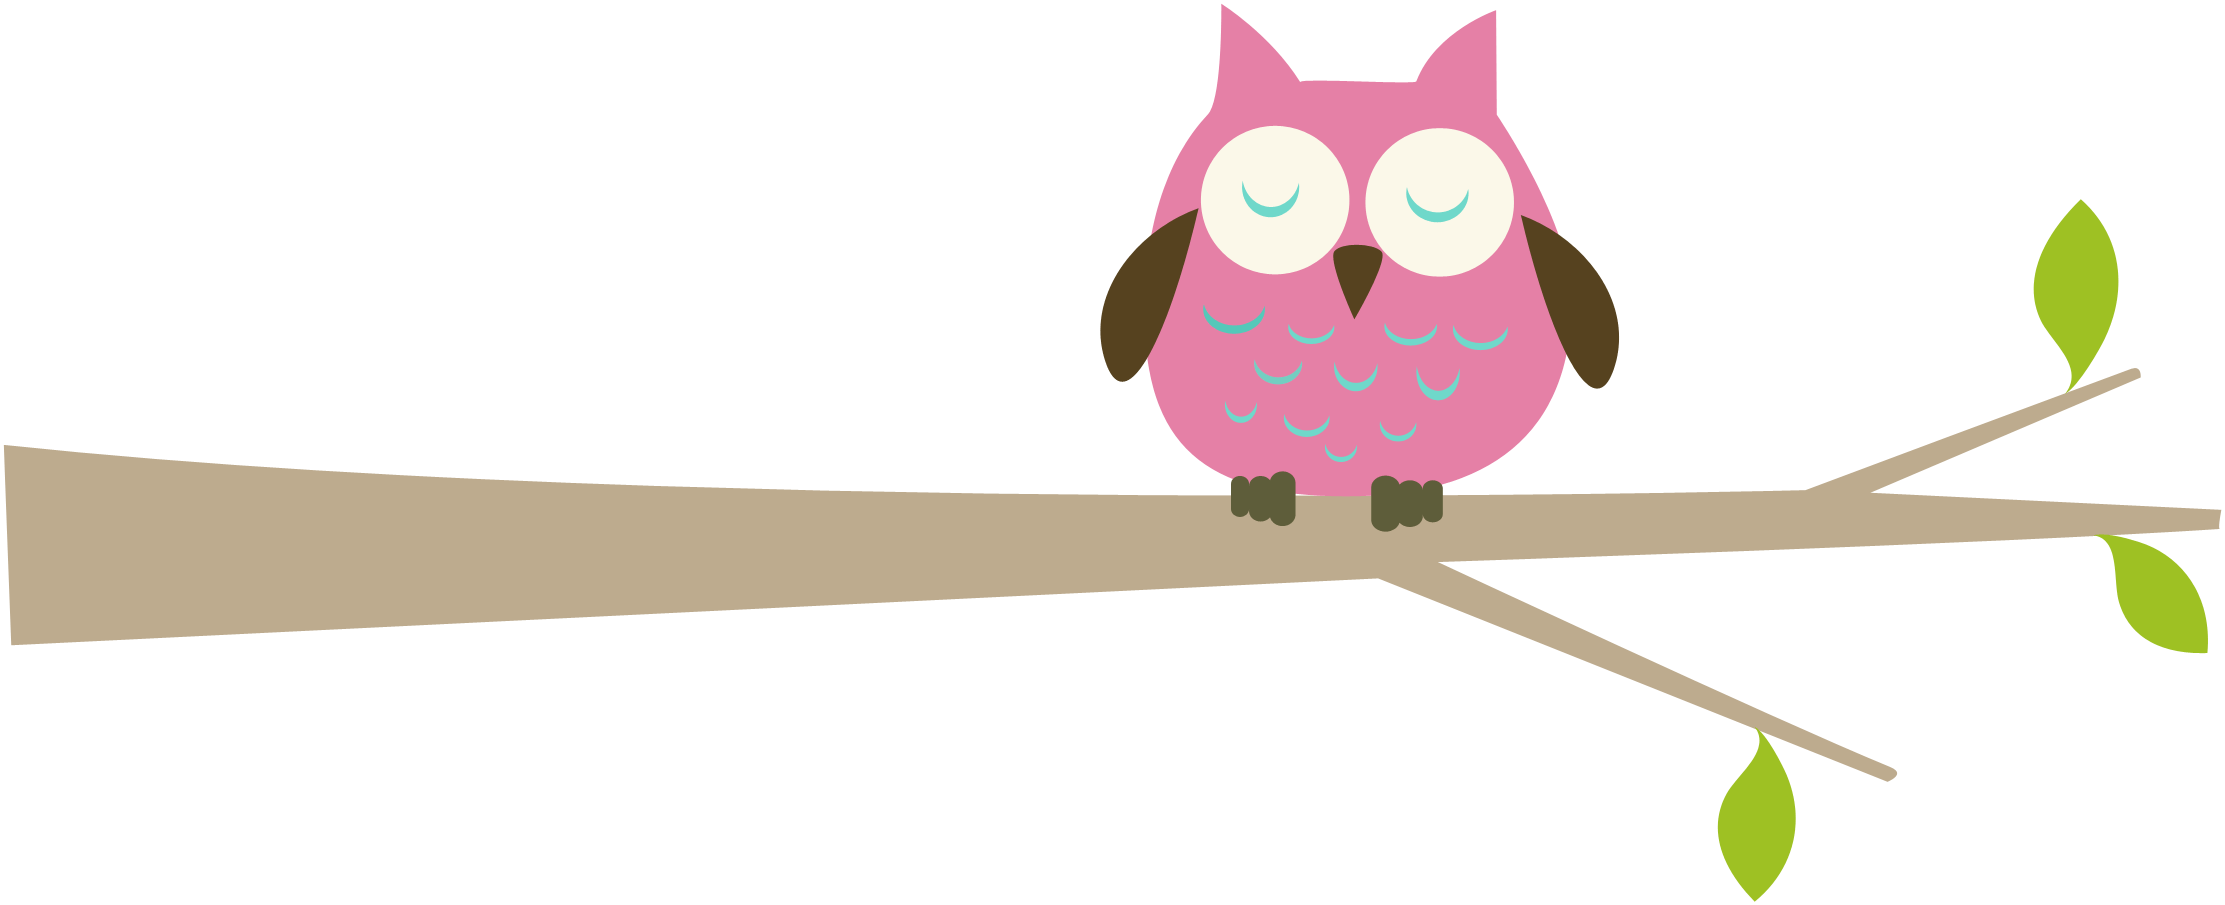 Cliparts zone clip art. Clipart owl spring